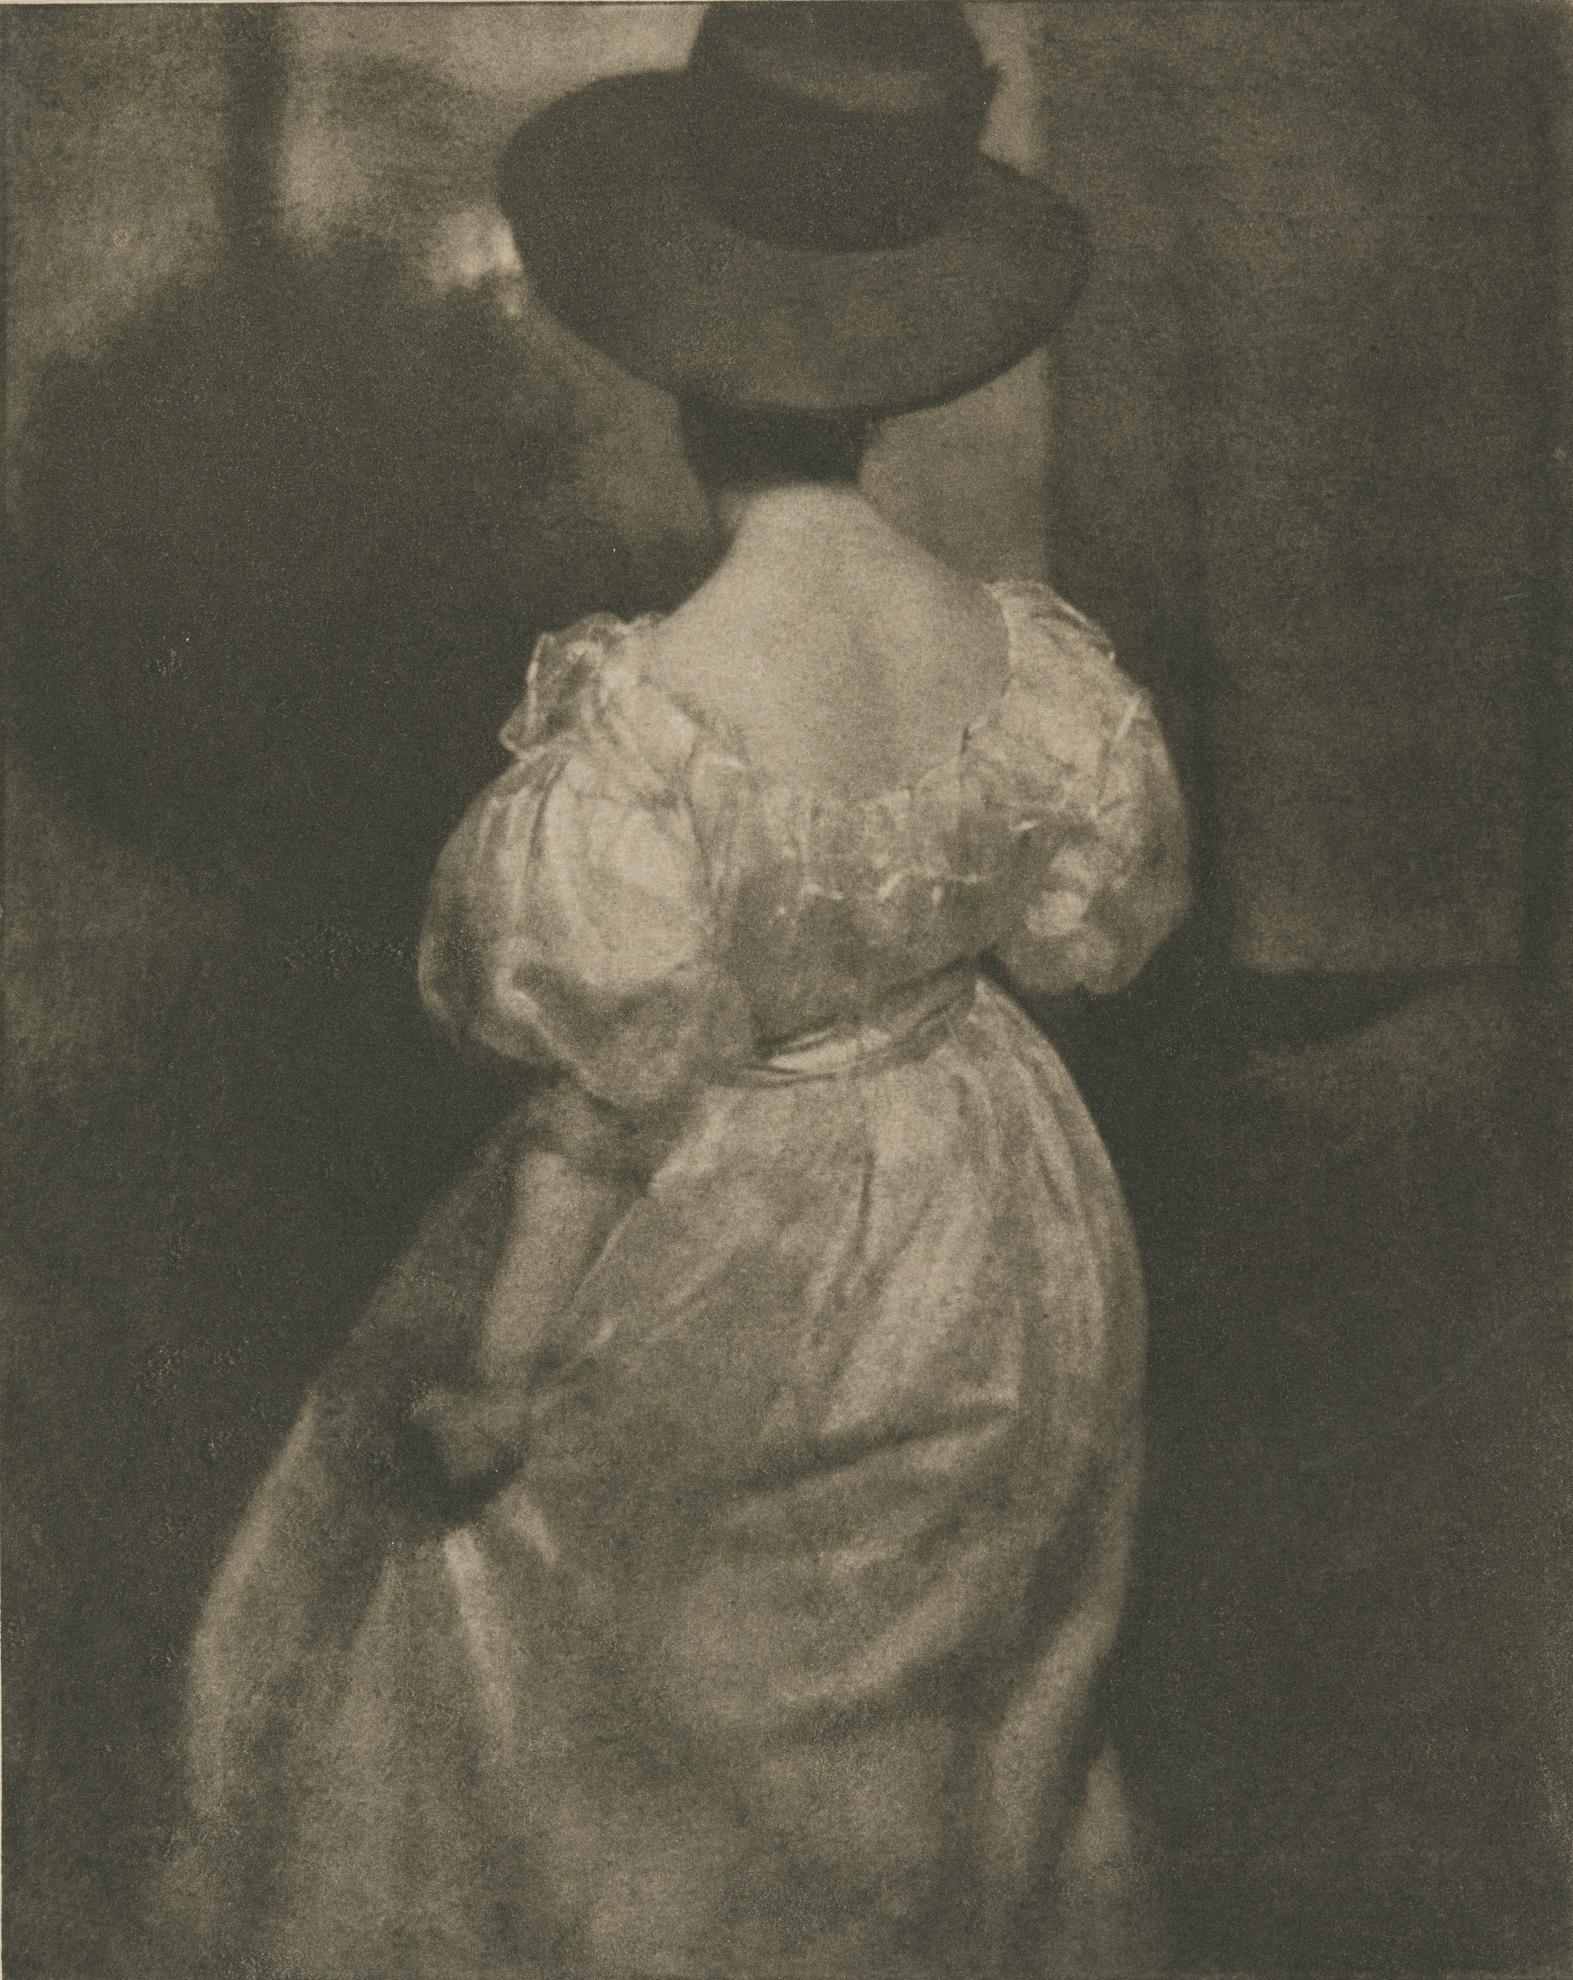 Heinrich Kuhn-Miss Mary, Tyrol, 1910-1910